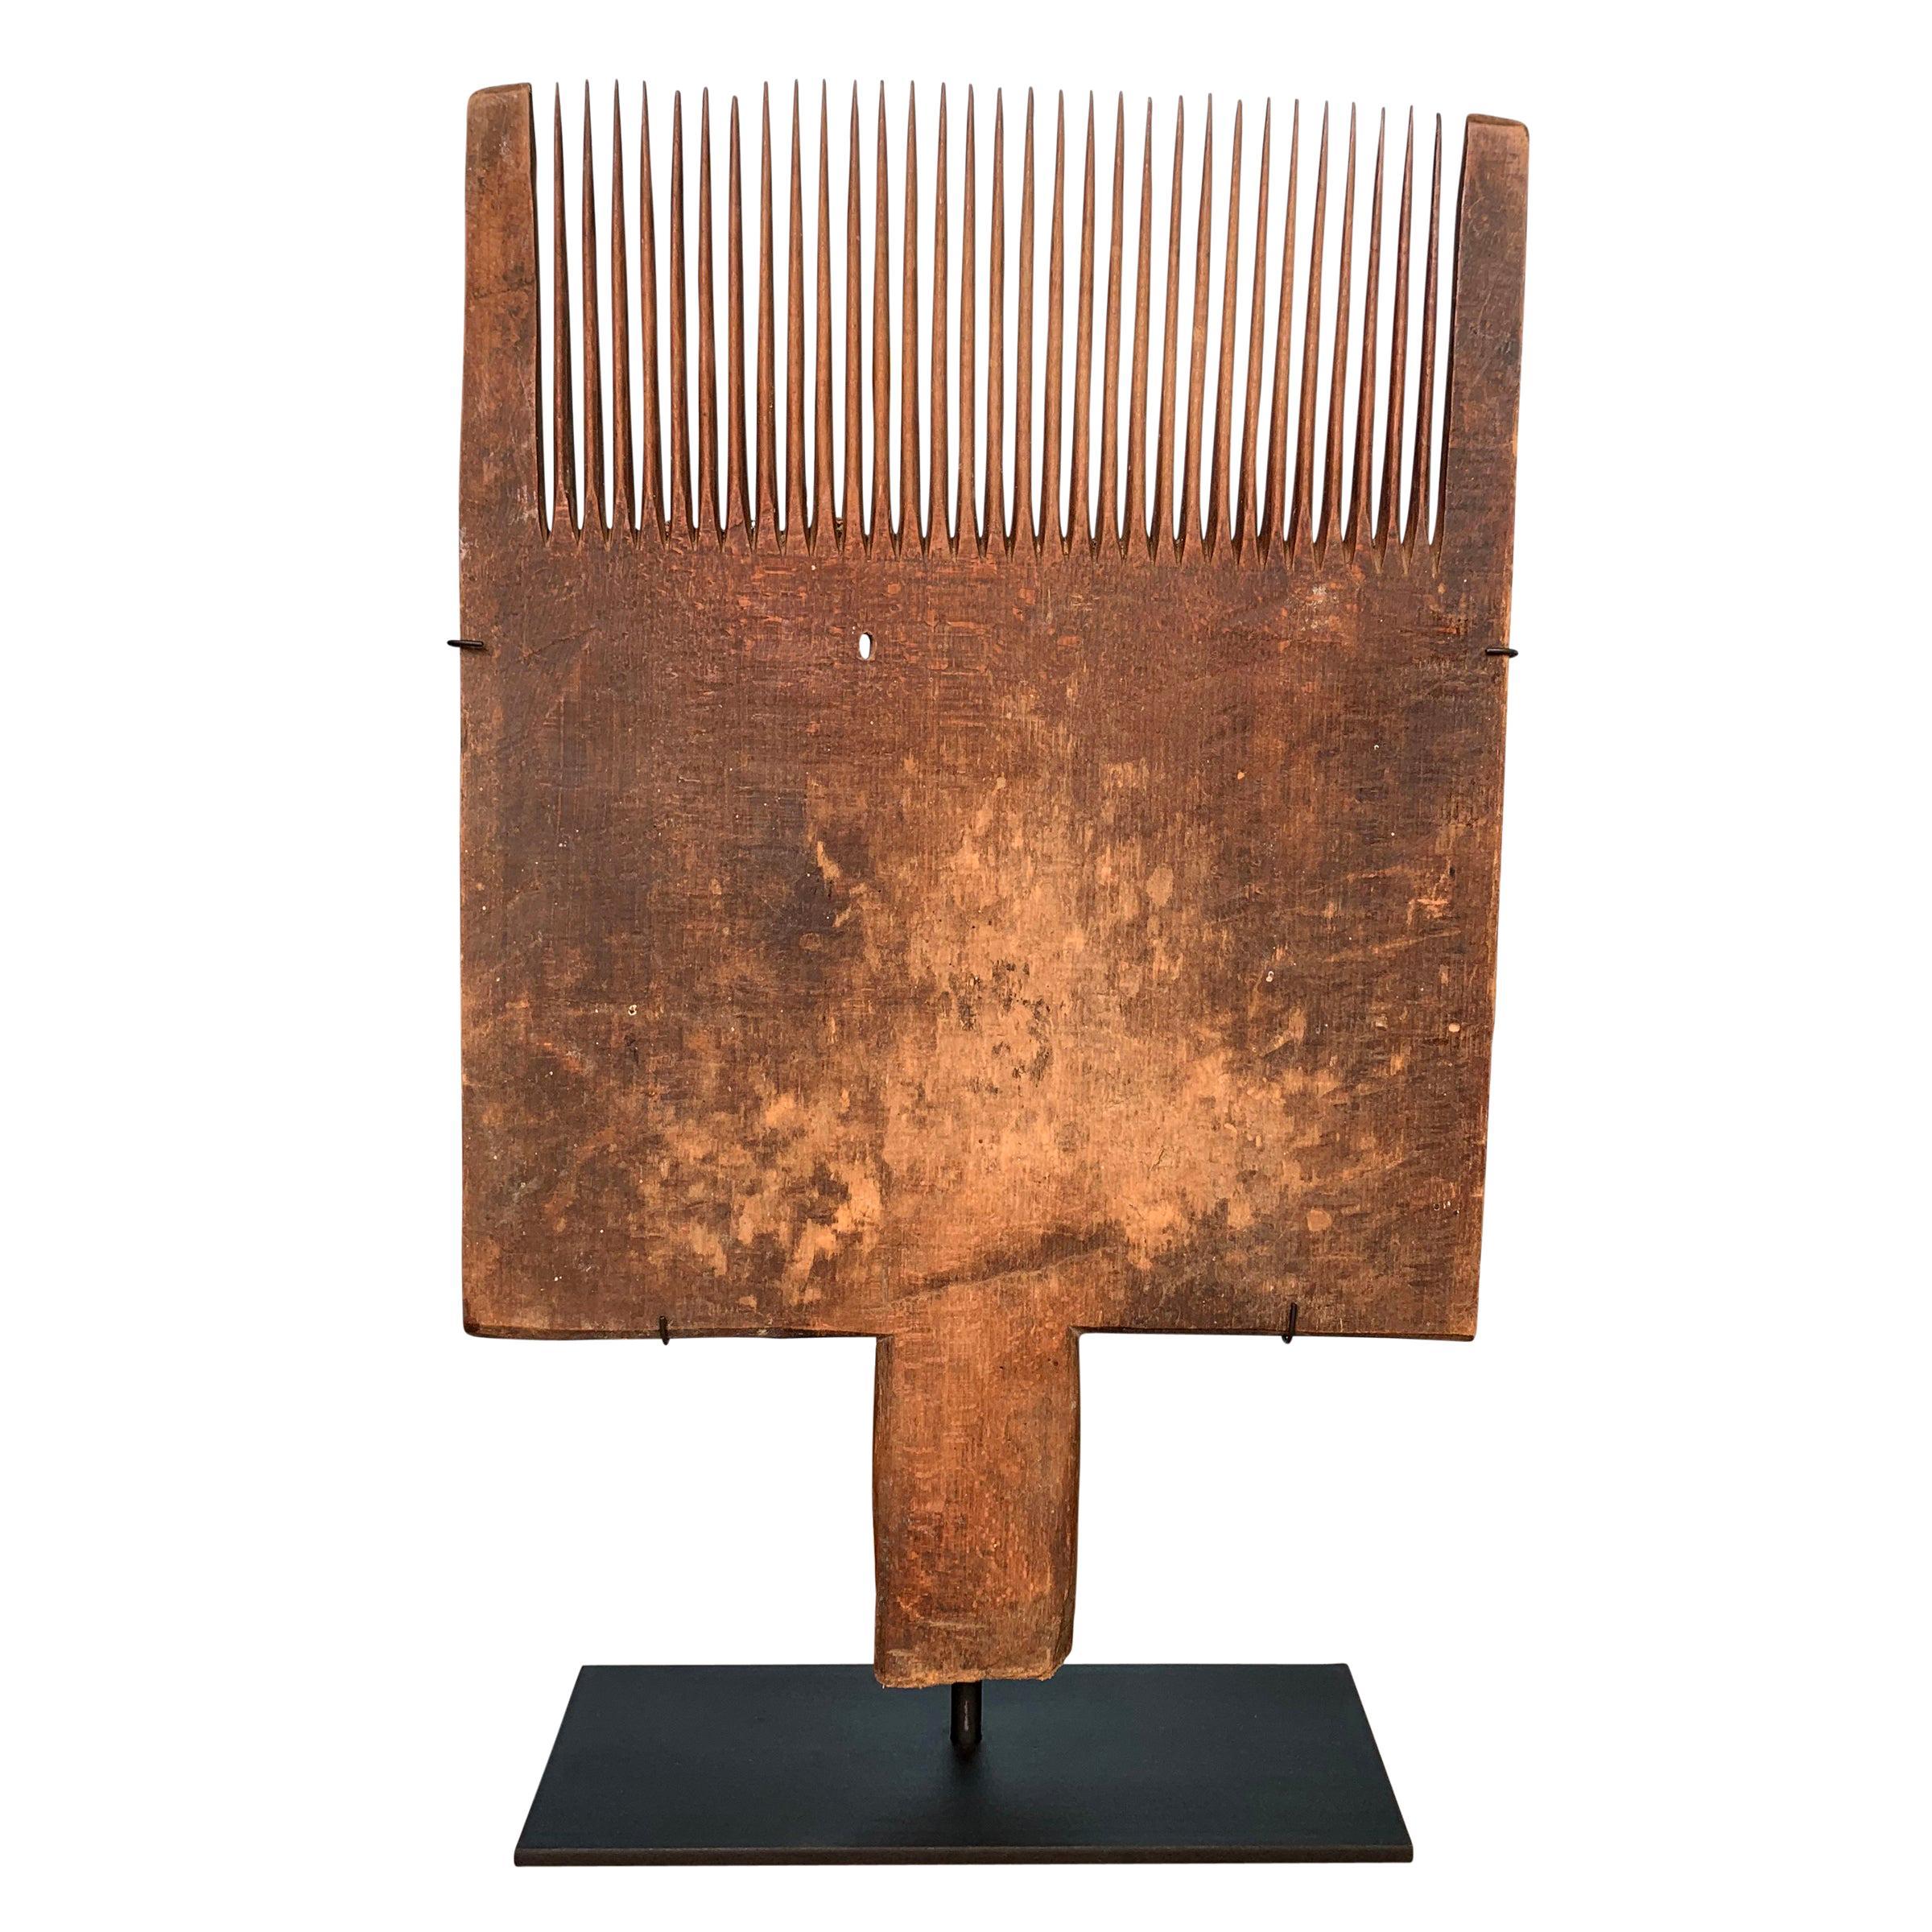 19th Century Flax Carding Comb